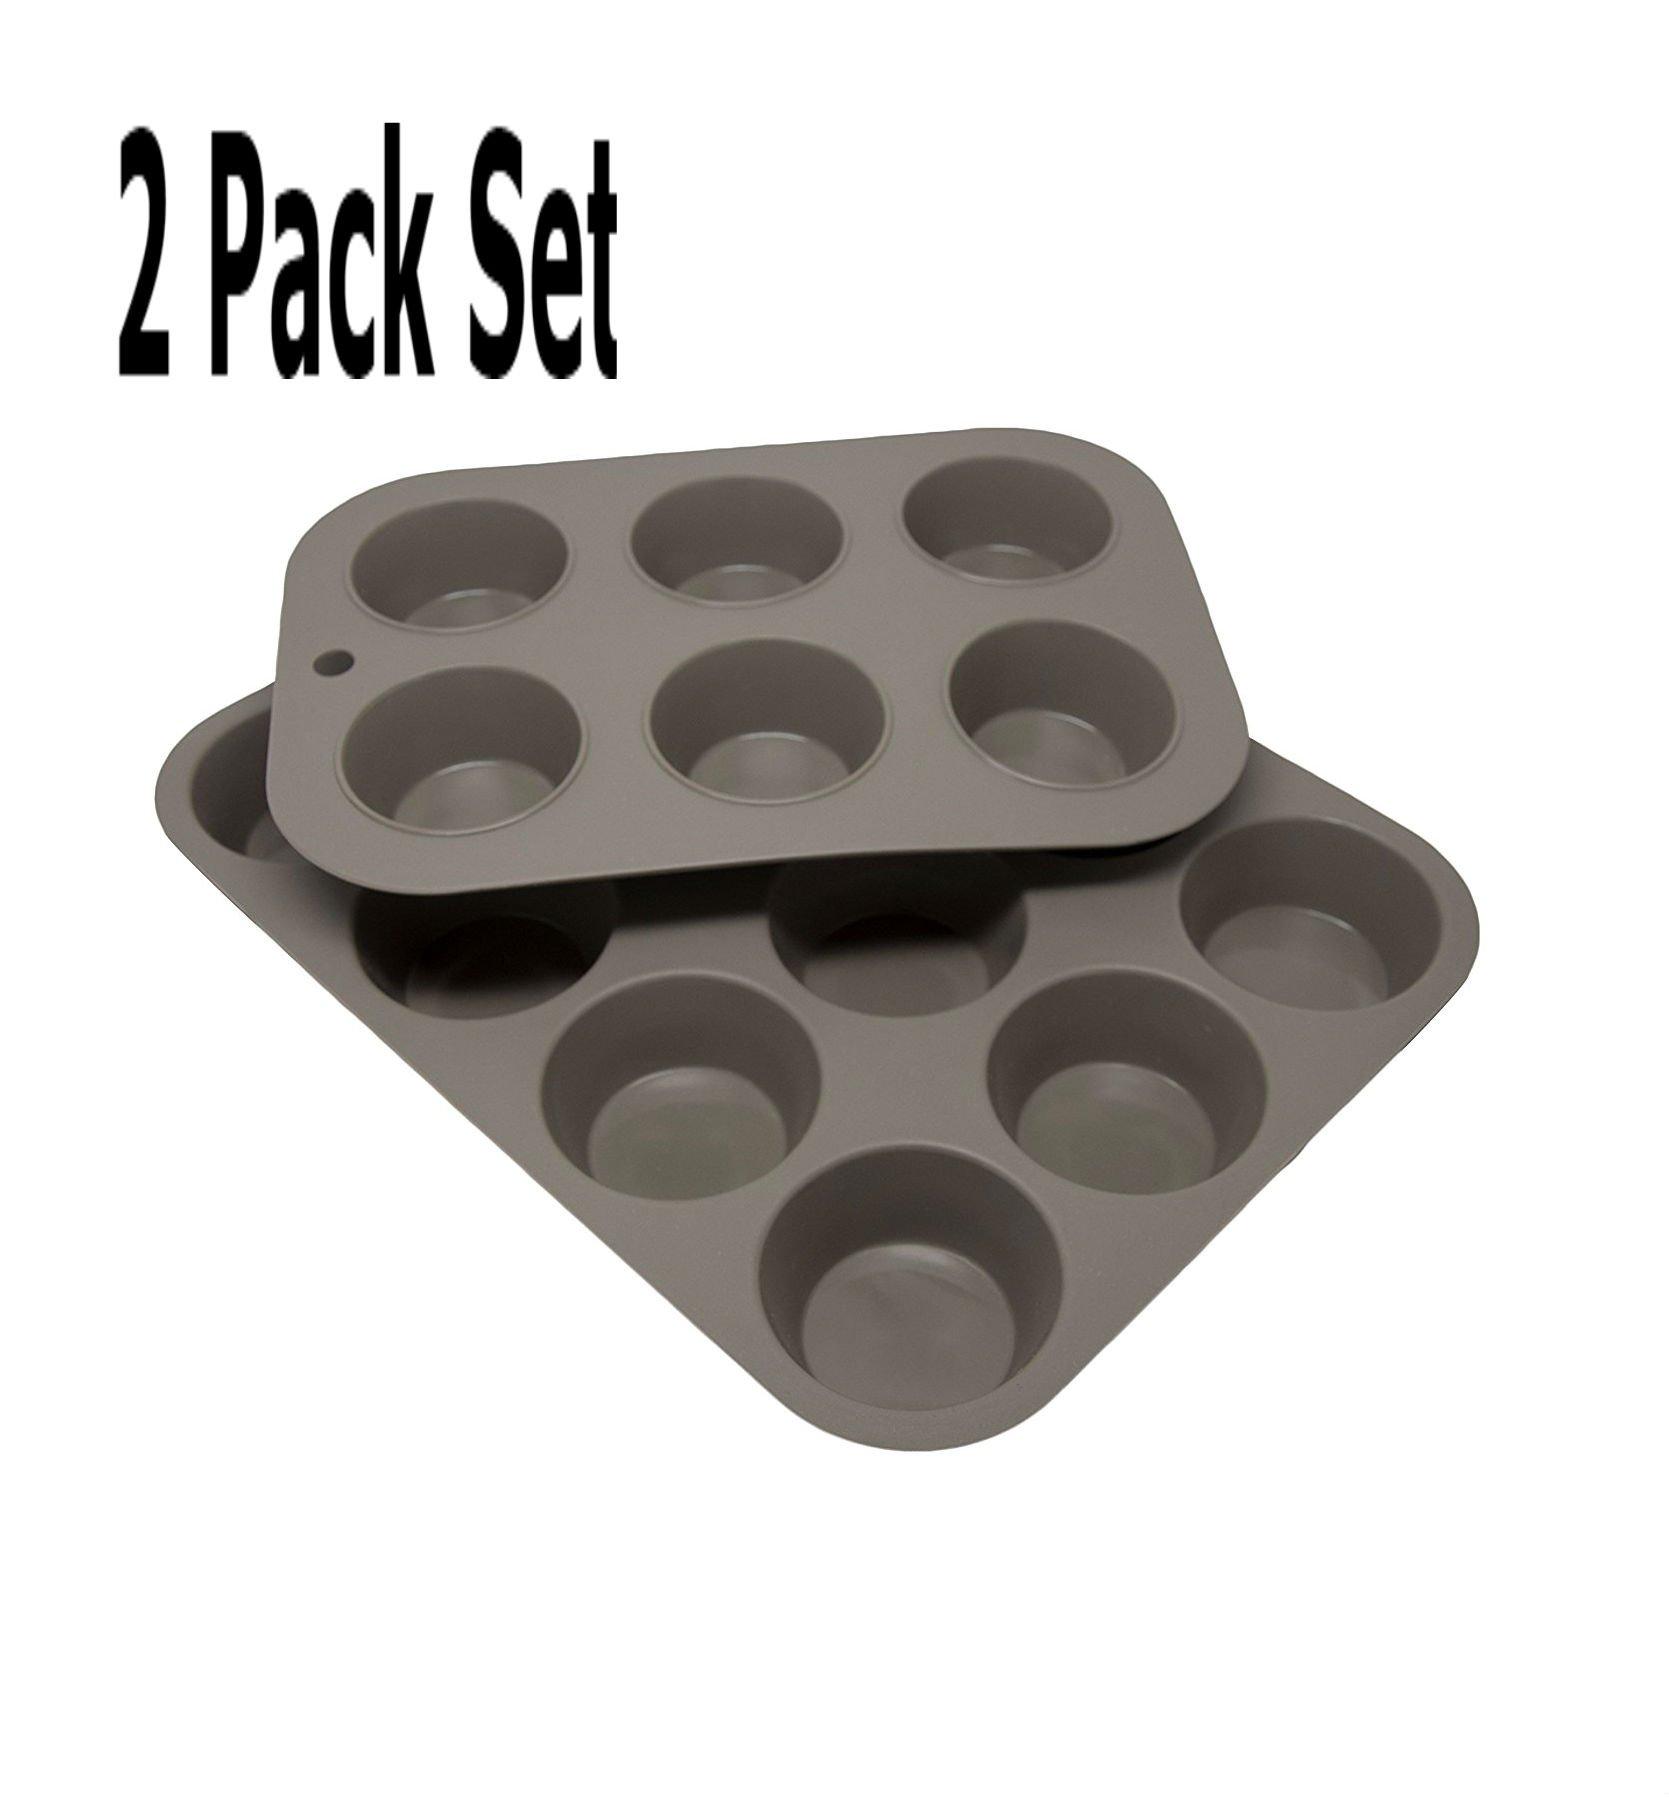 Silicone Baking Cake Pans Kitchen Cookware Kitchen Muffin Pan Cupcakes Circle 8 x 8 Inch Pie Pan (Gray (Muffin) Set)